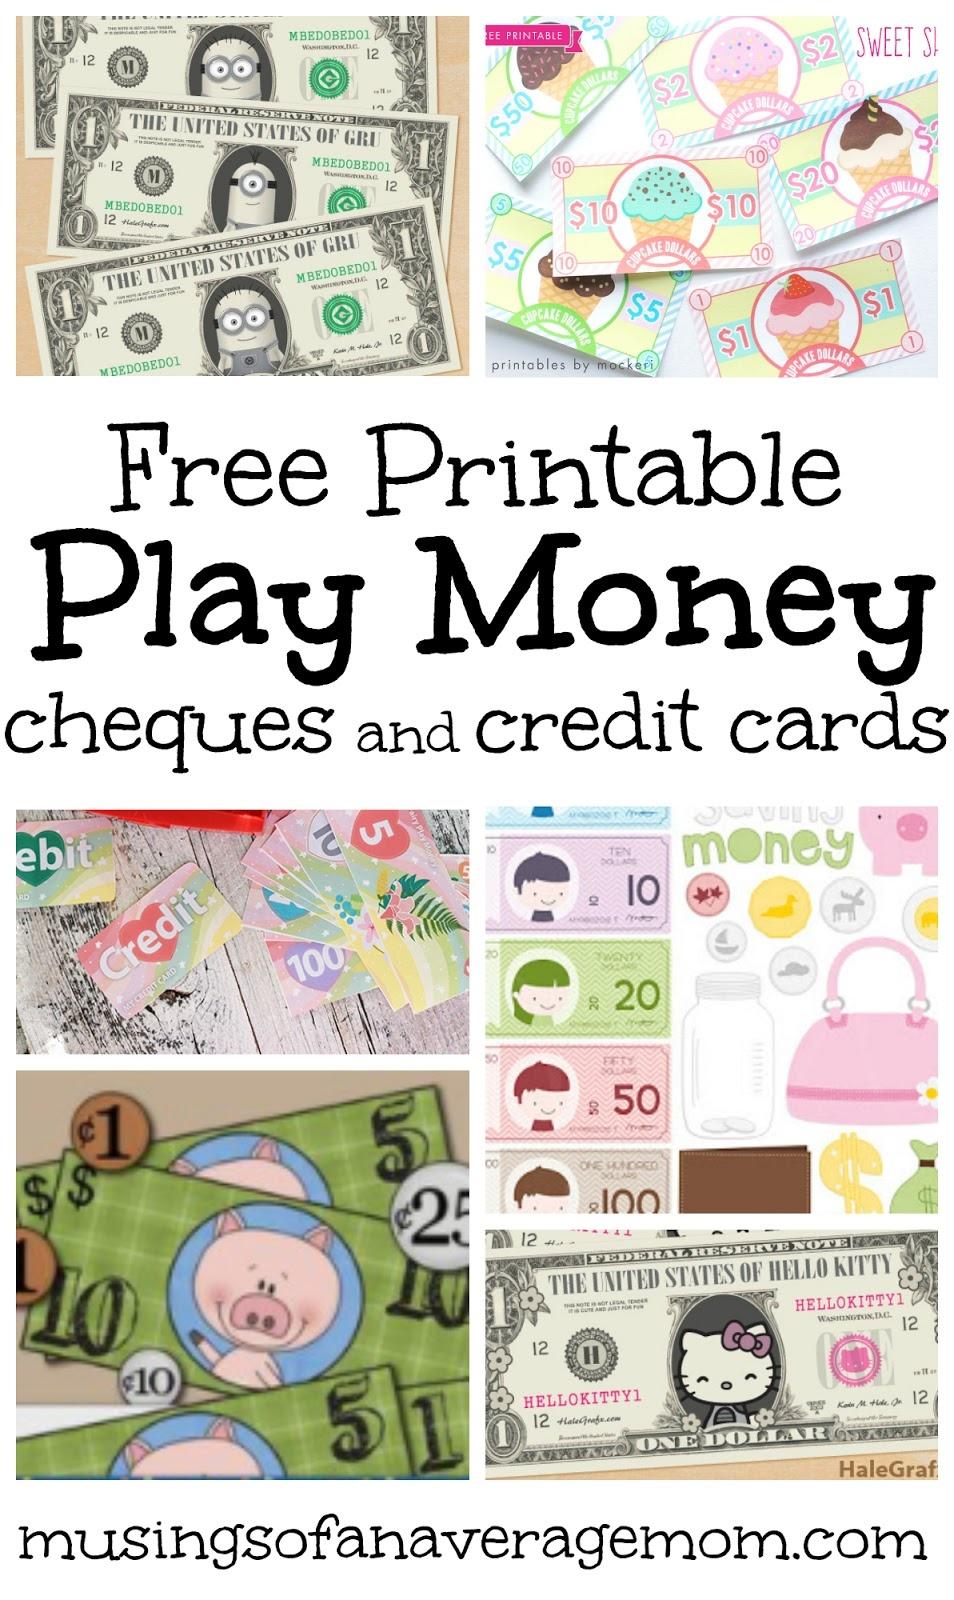 Musings Of An Average Mom: Pretend Play Money - Free Printable Play Money